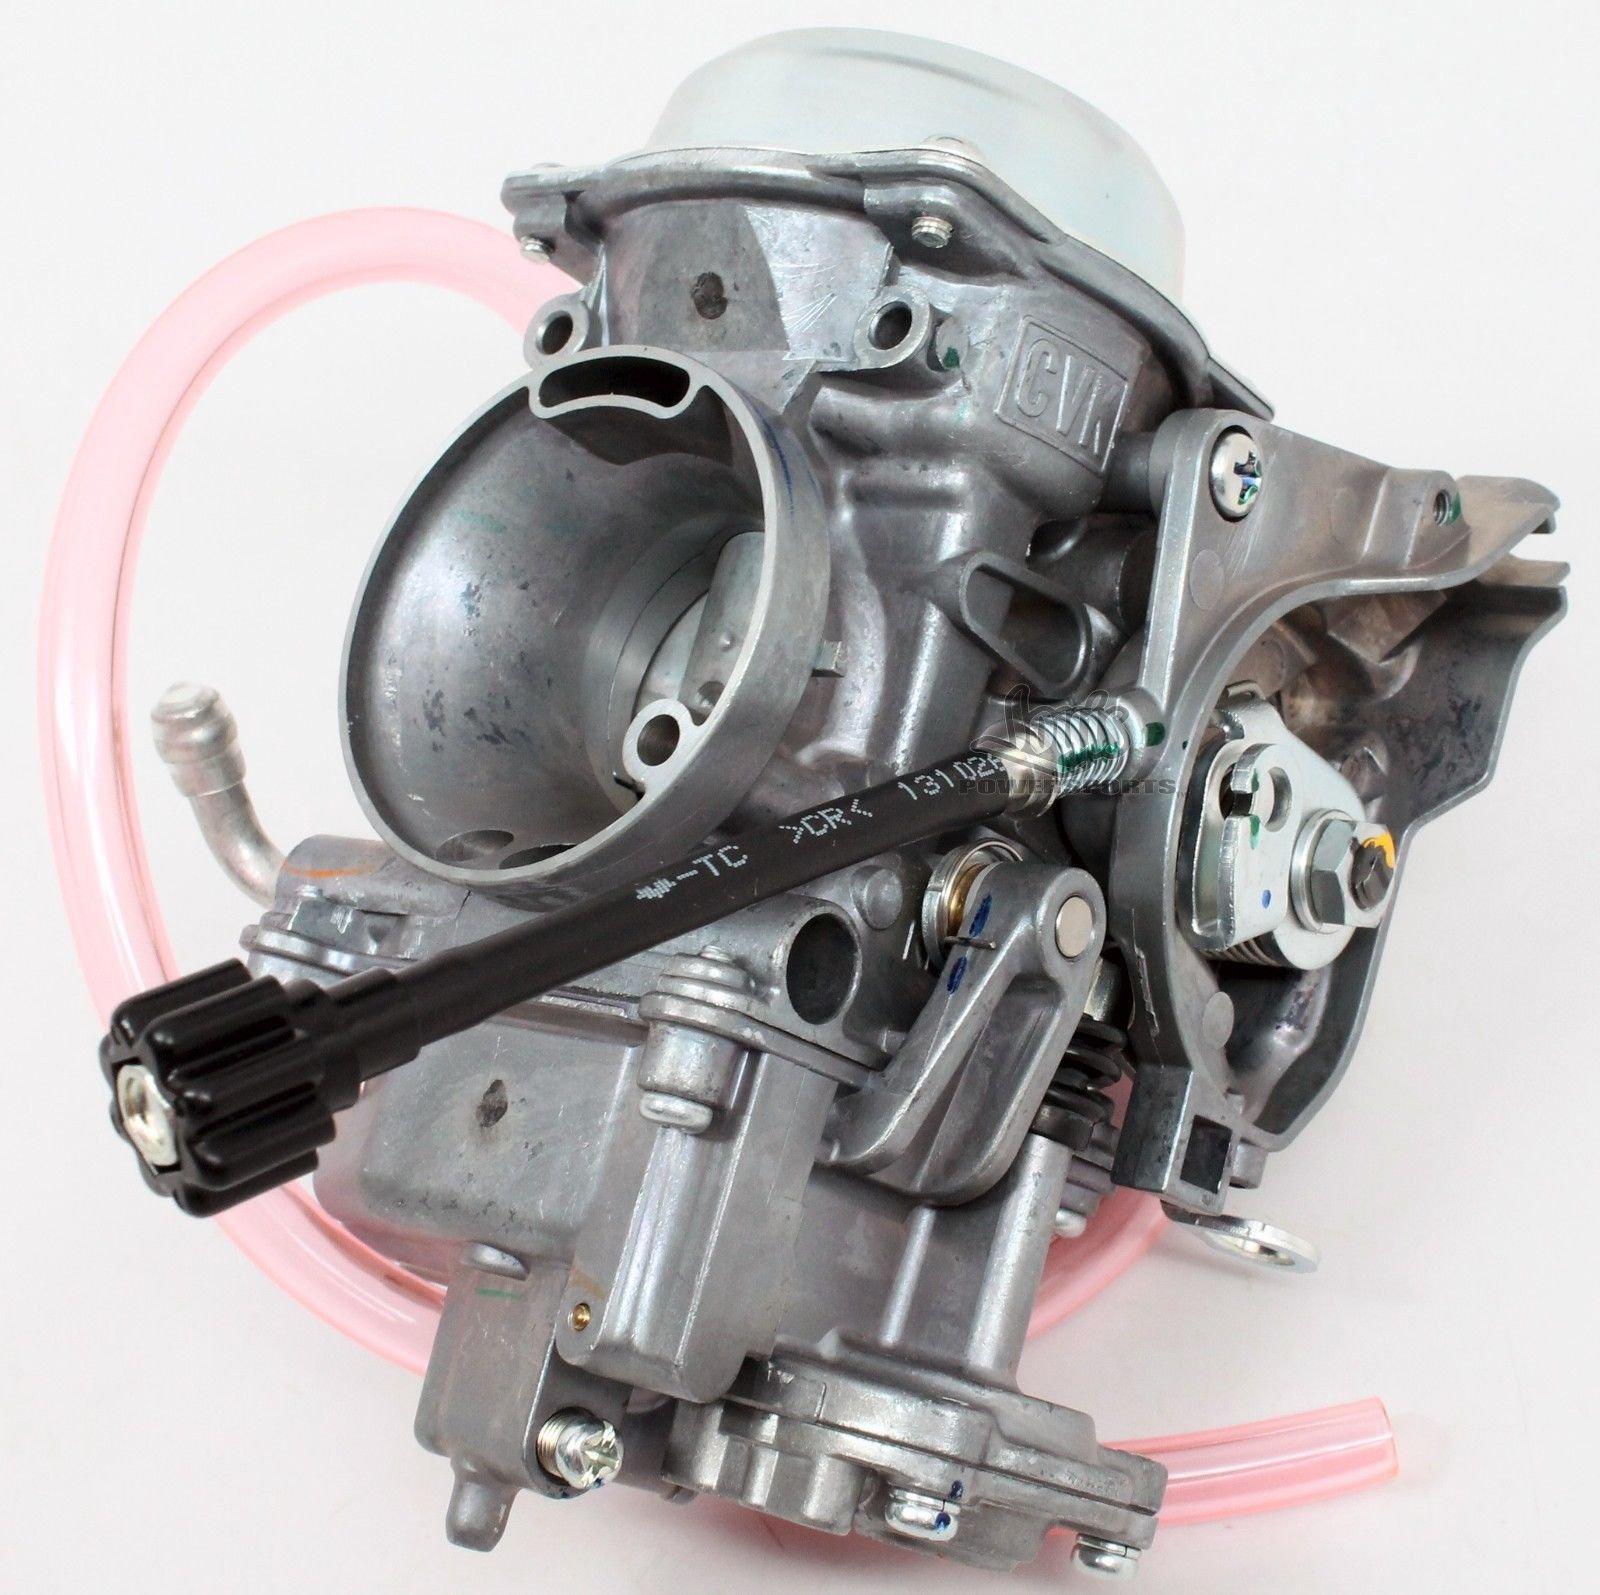 Arctic Cat 500 ATV 500cc Carburetor Carb Assembly 0470-449 ATV